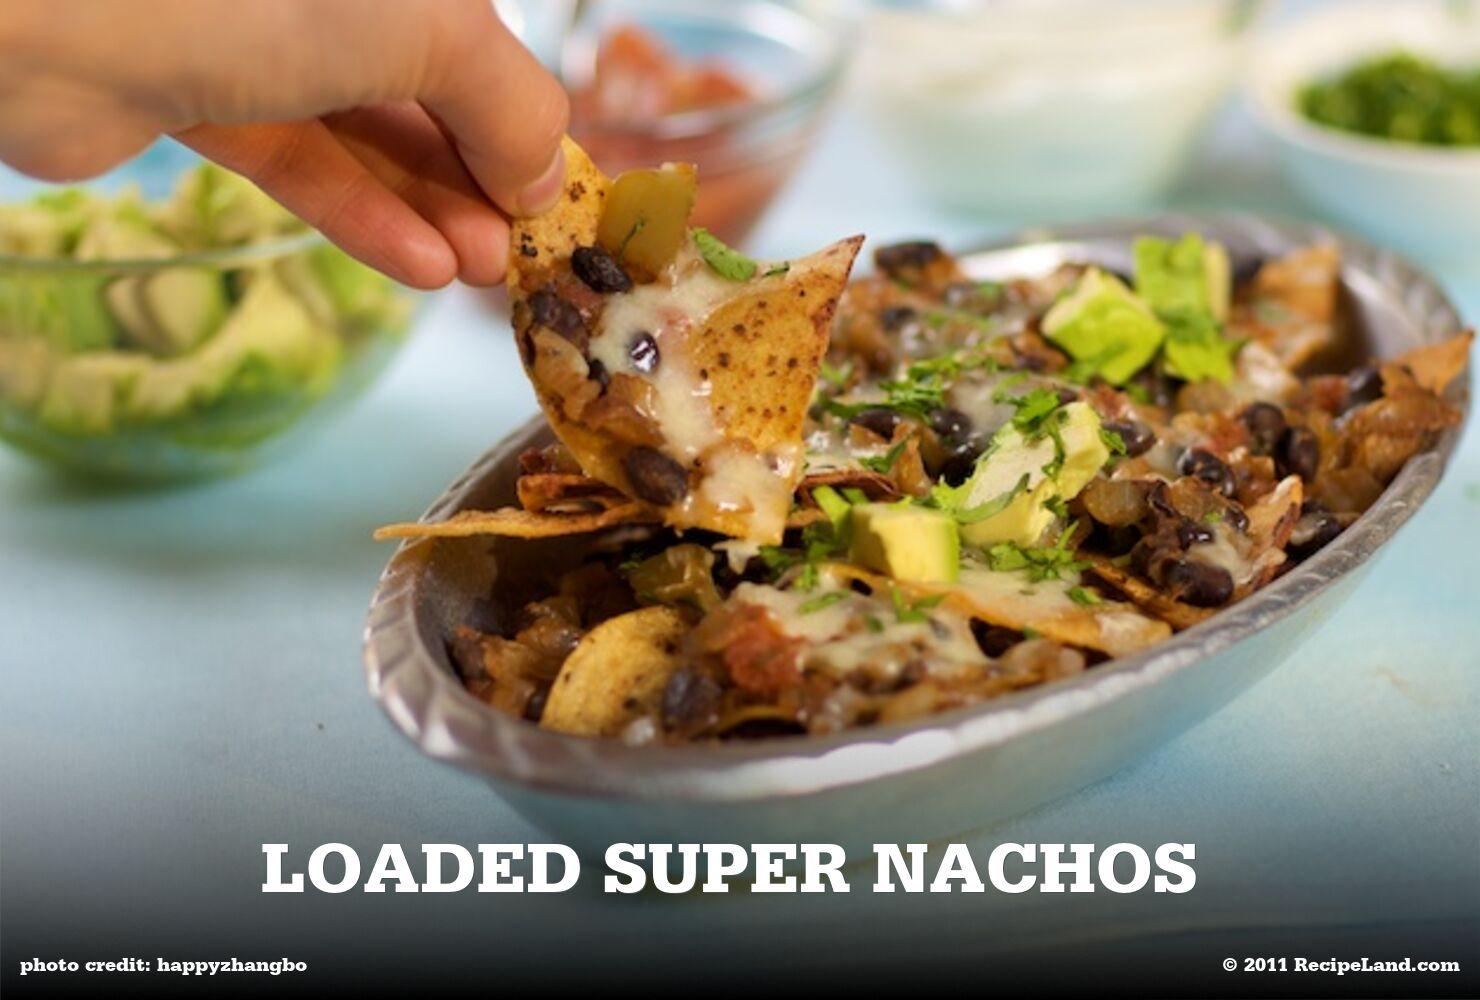 Loaded Super Nachos